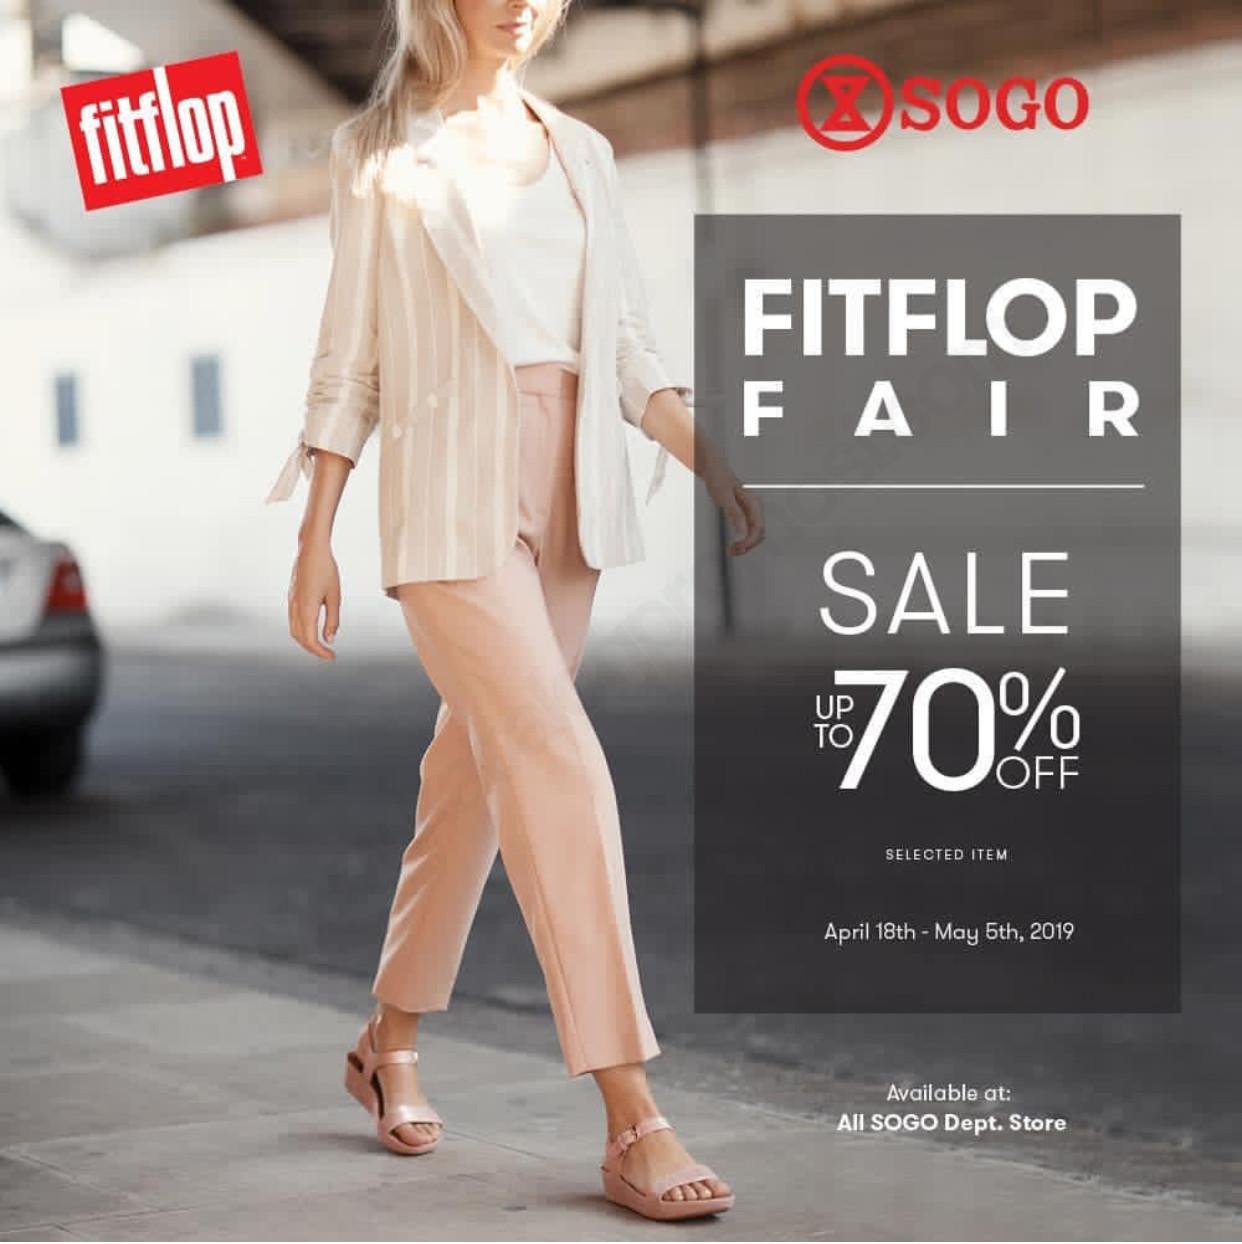 Diskon SOGO Department Store FlipFlop Fair Diskon sampai 70%